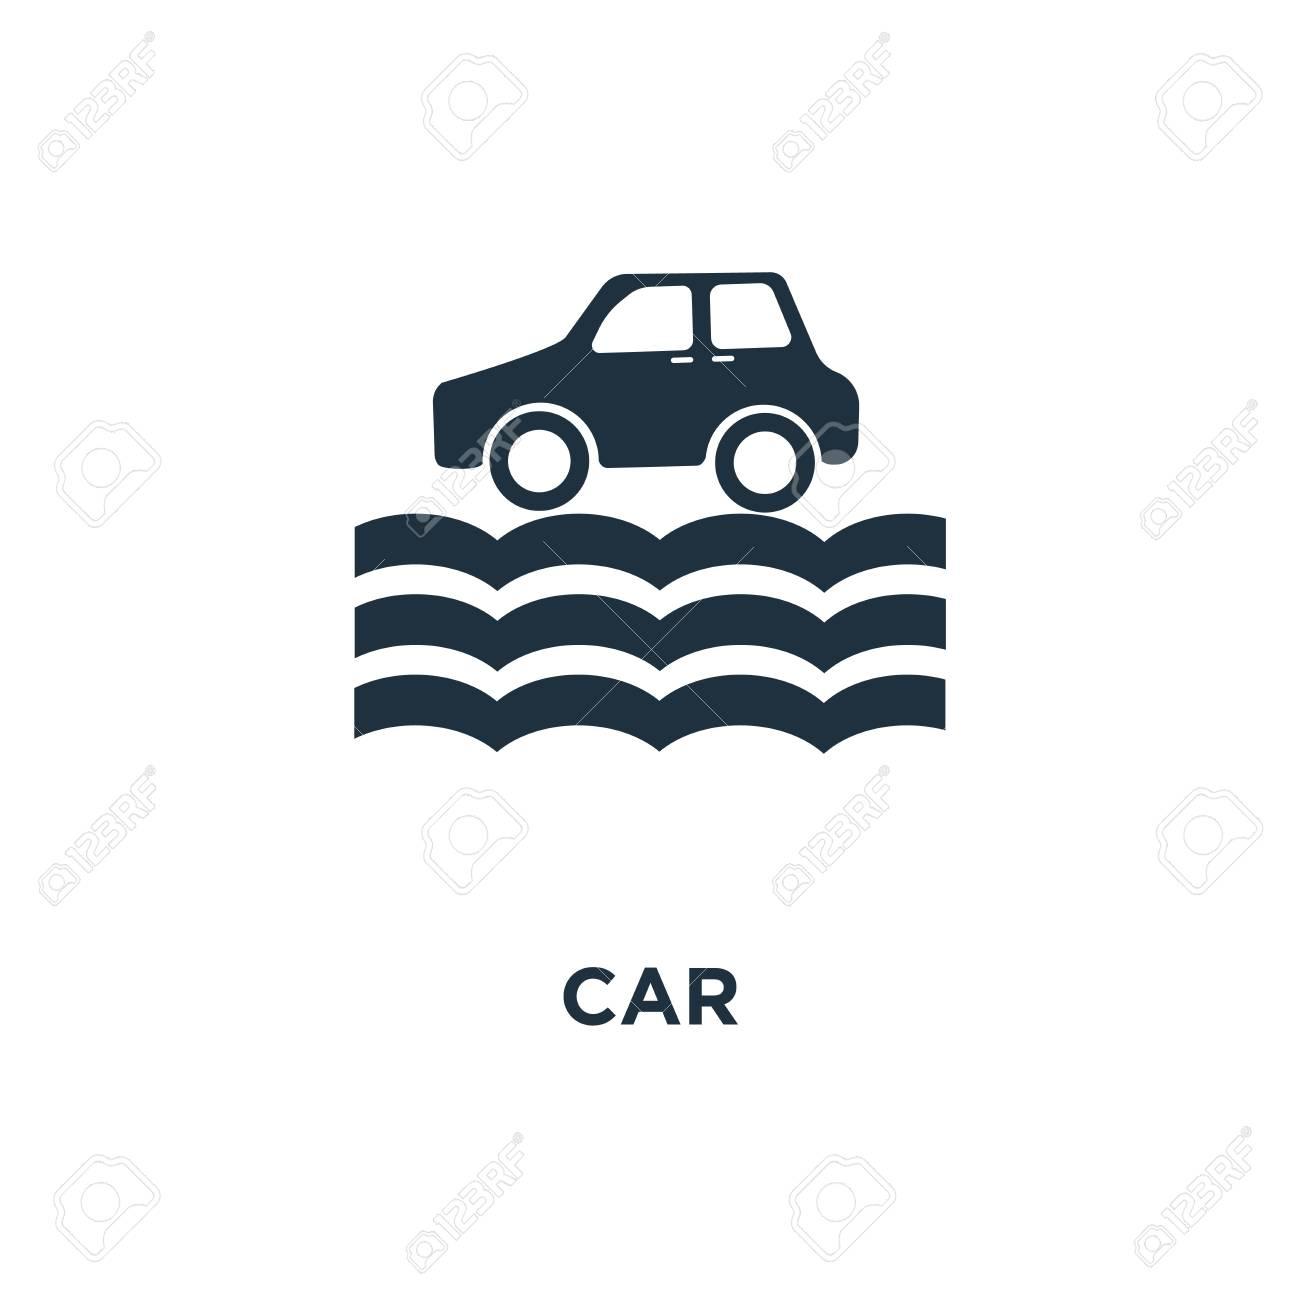 Car Icon Black Filled Vector Illustration Car Symbol On White